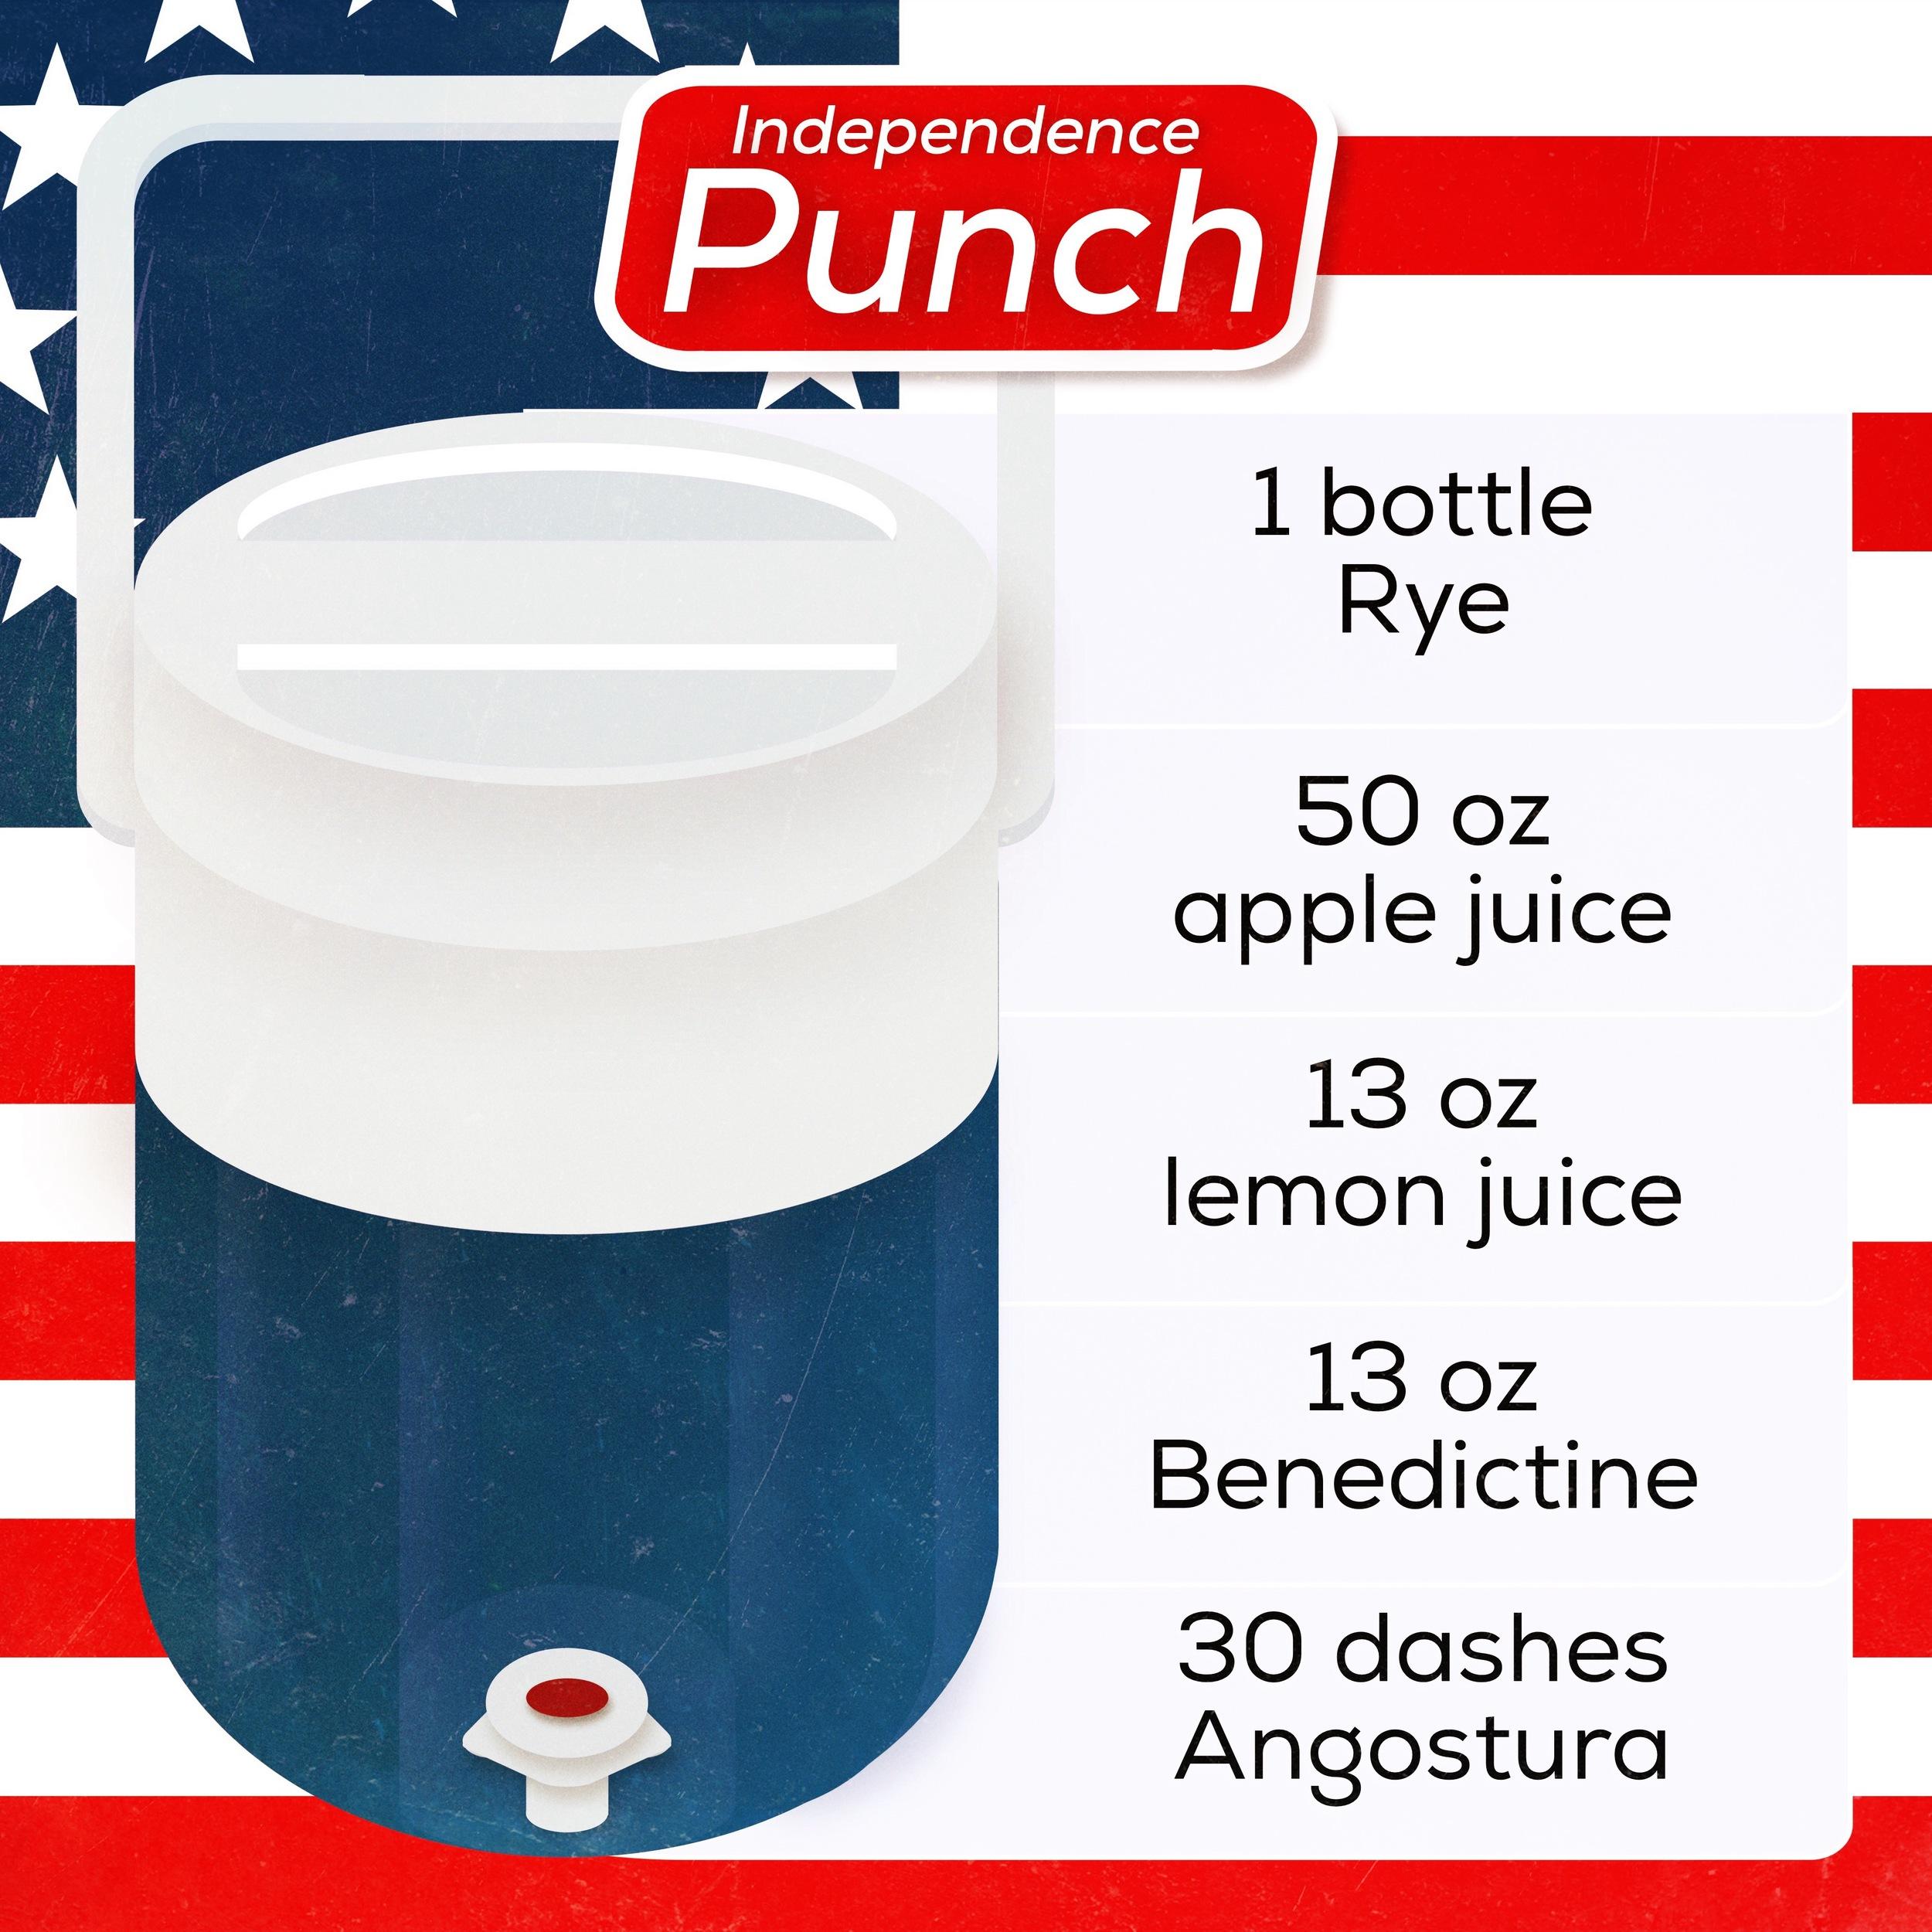 coleman cooler 4th of july independence punch andrew bohrer.JPG